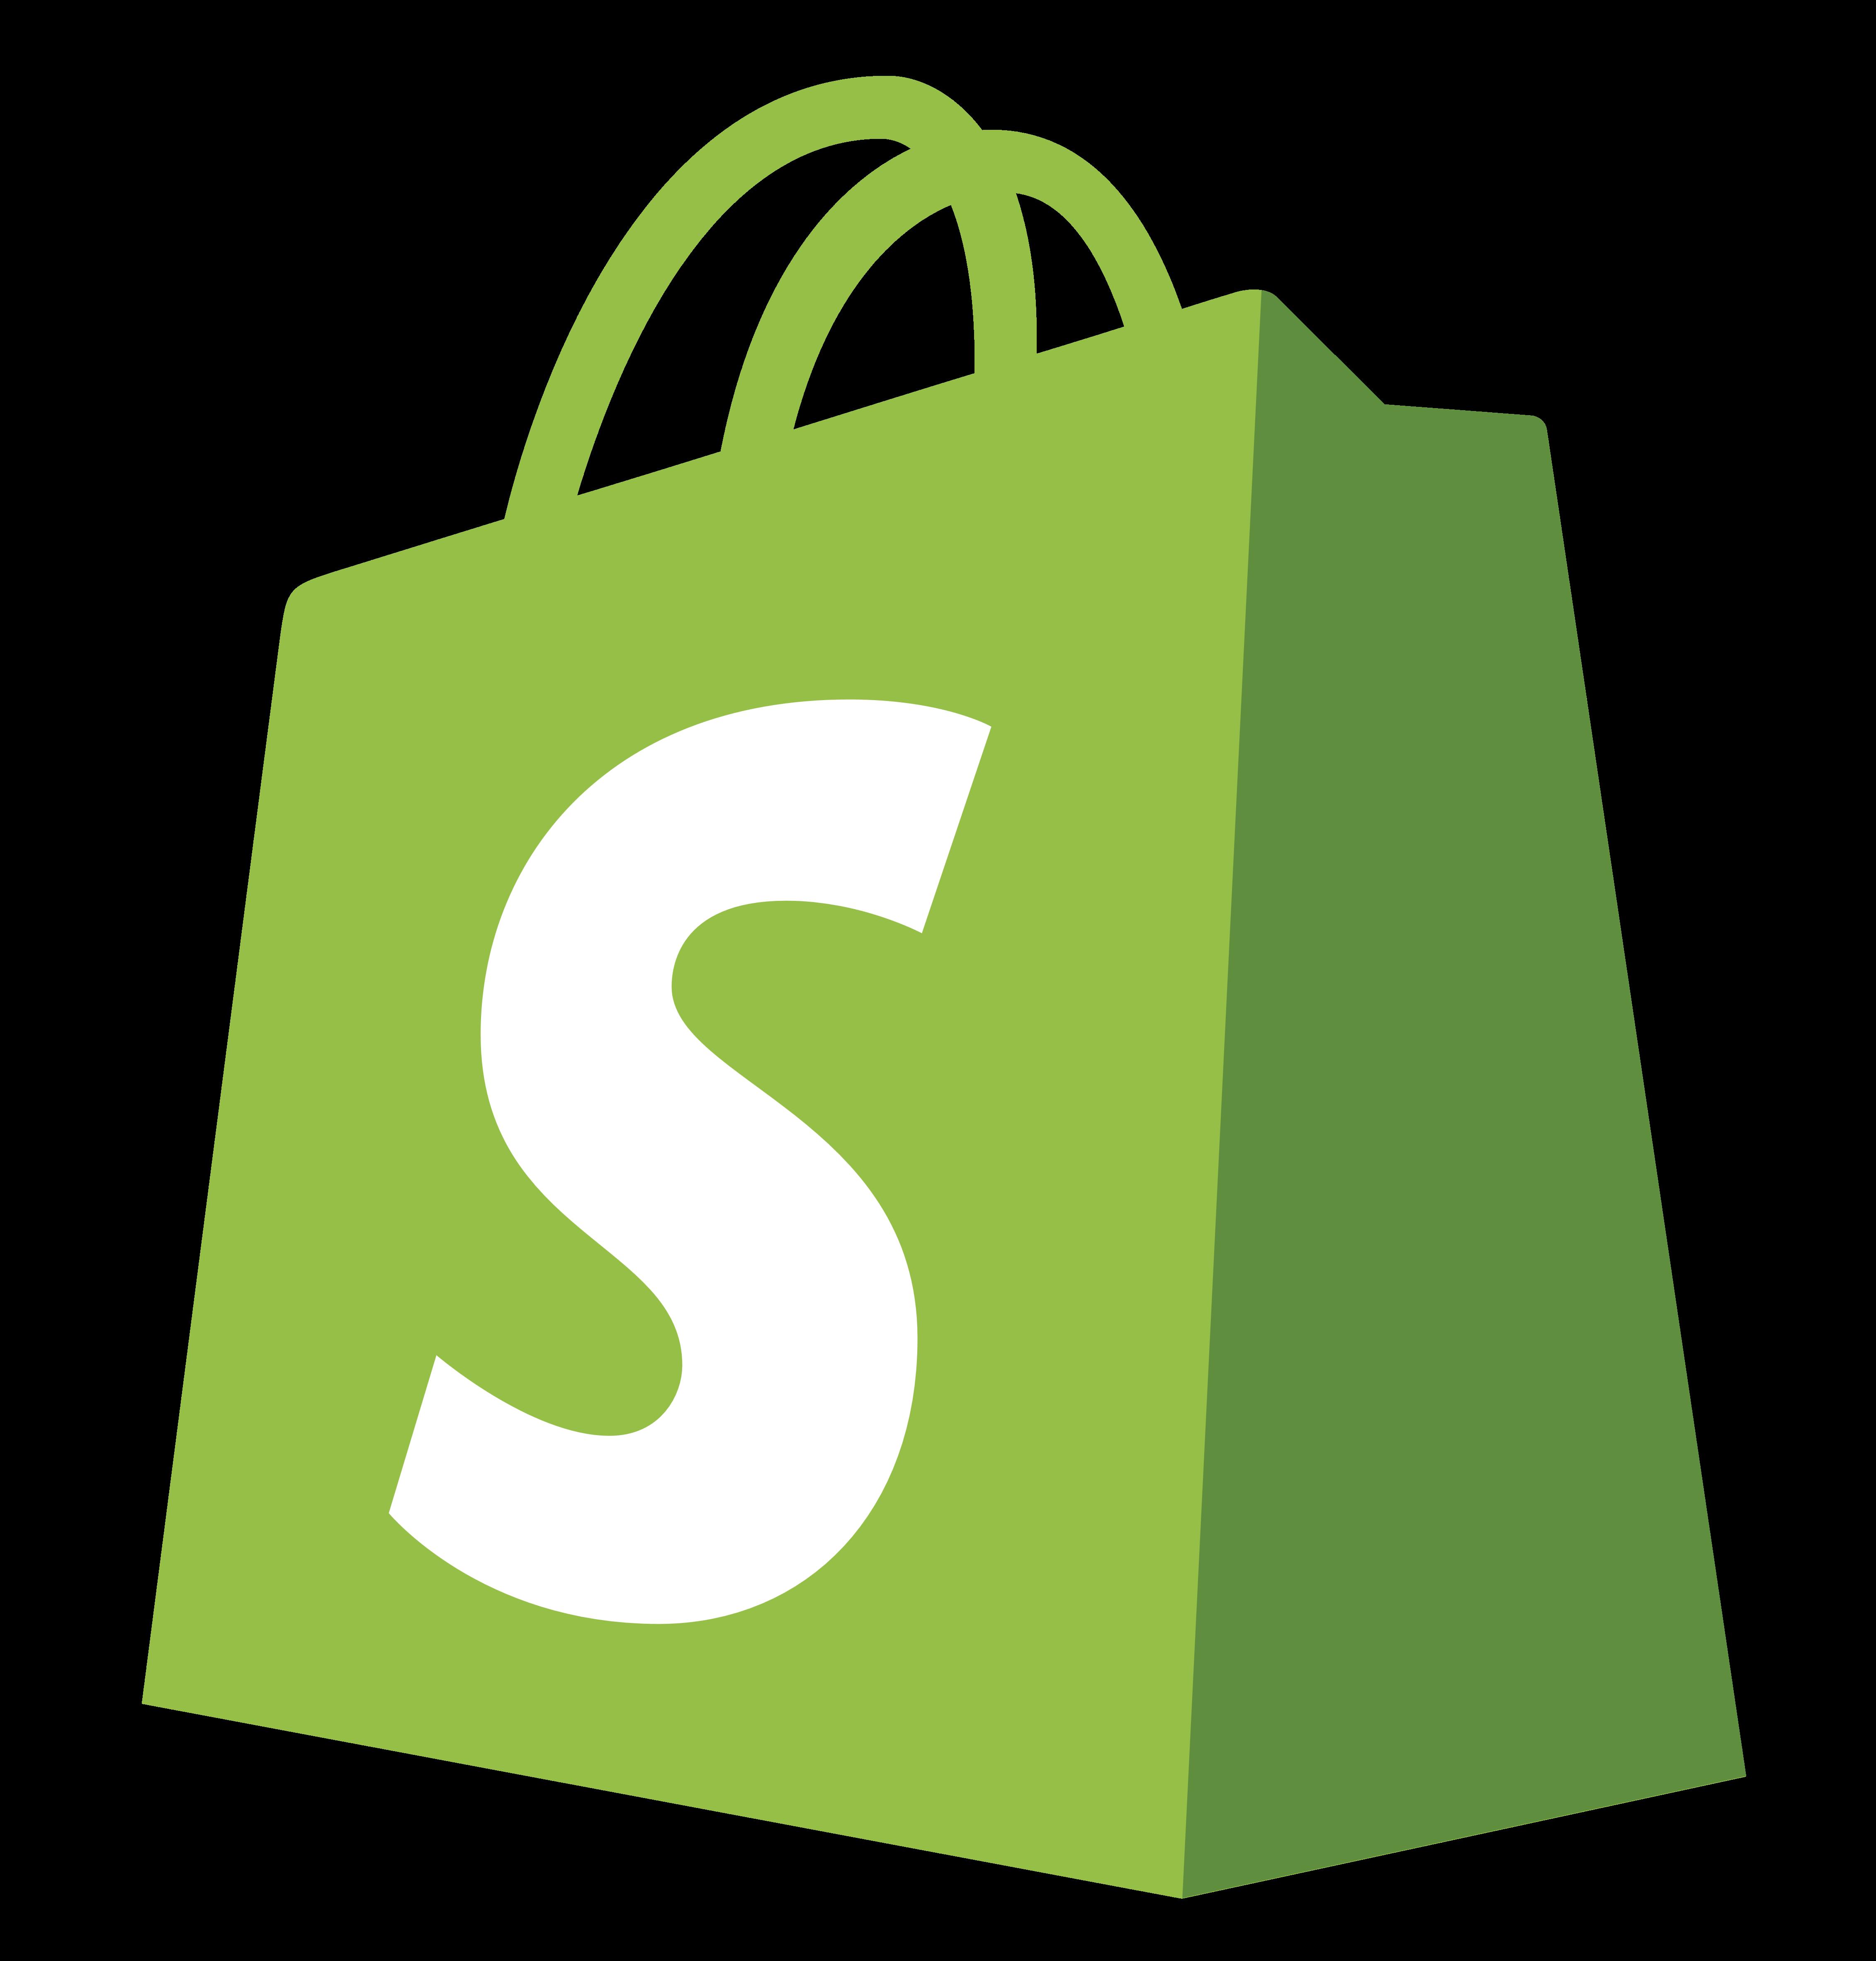 shopify � logos download